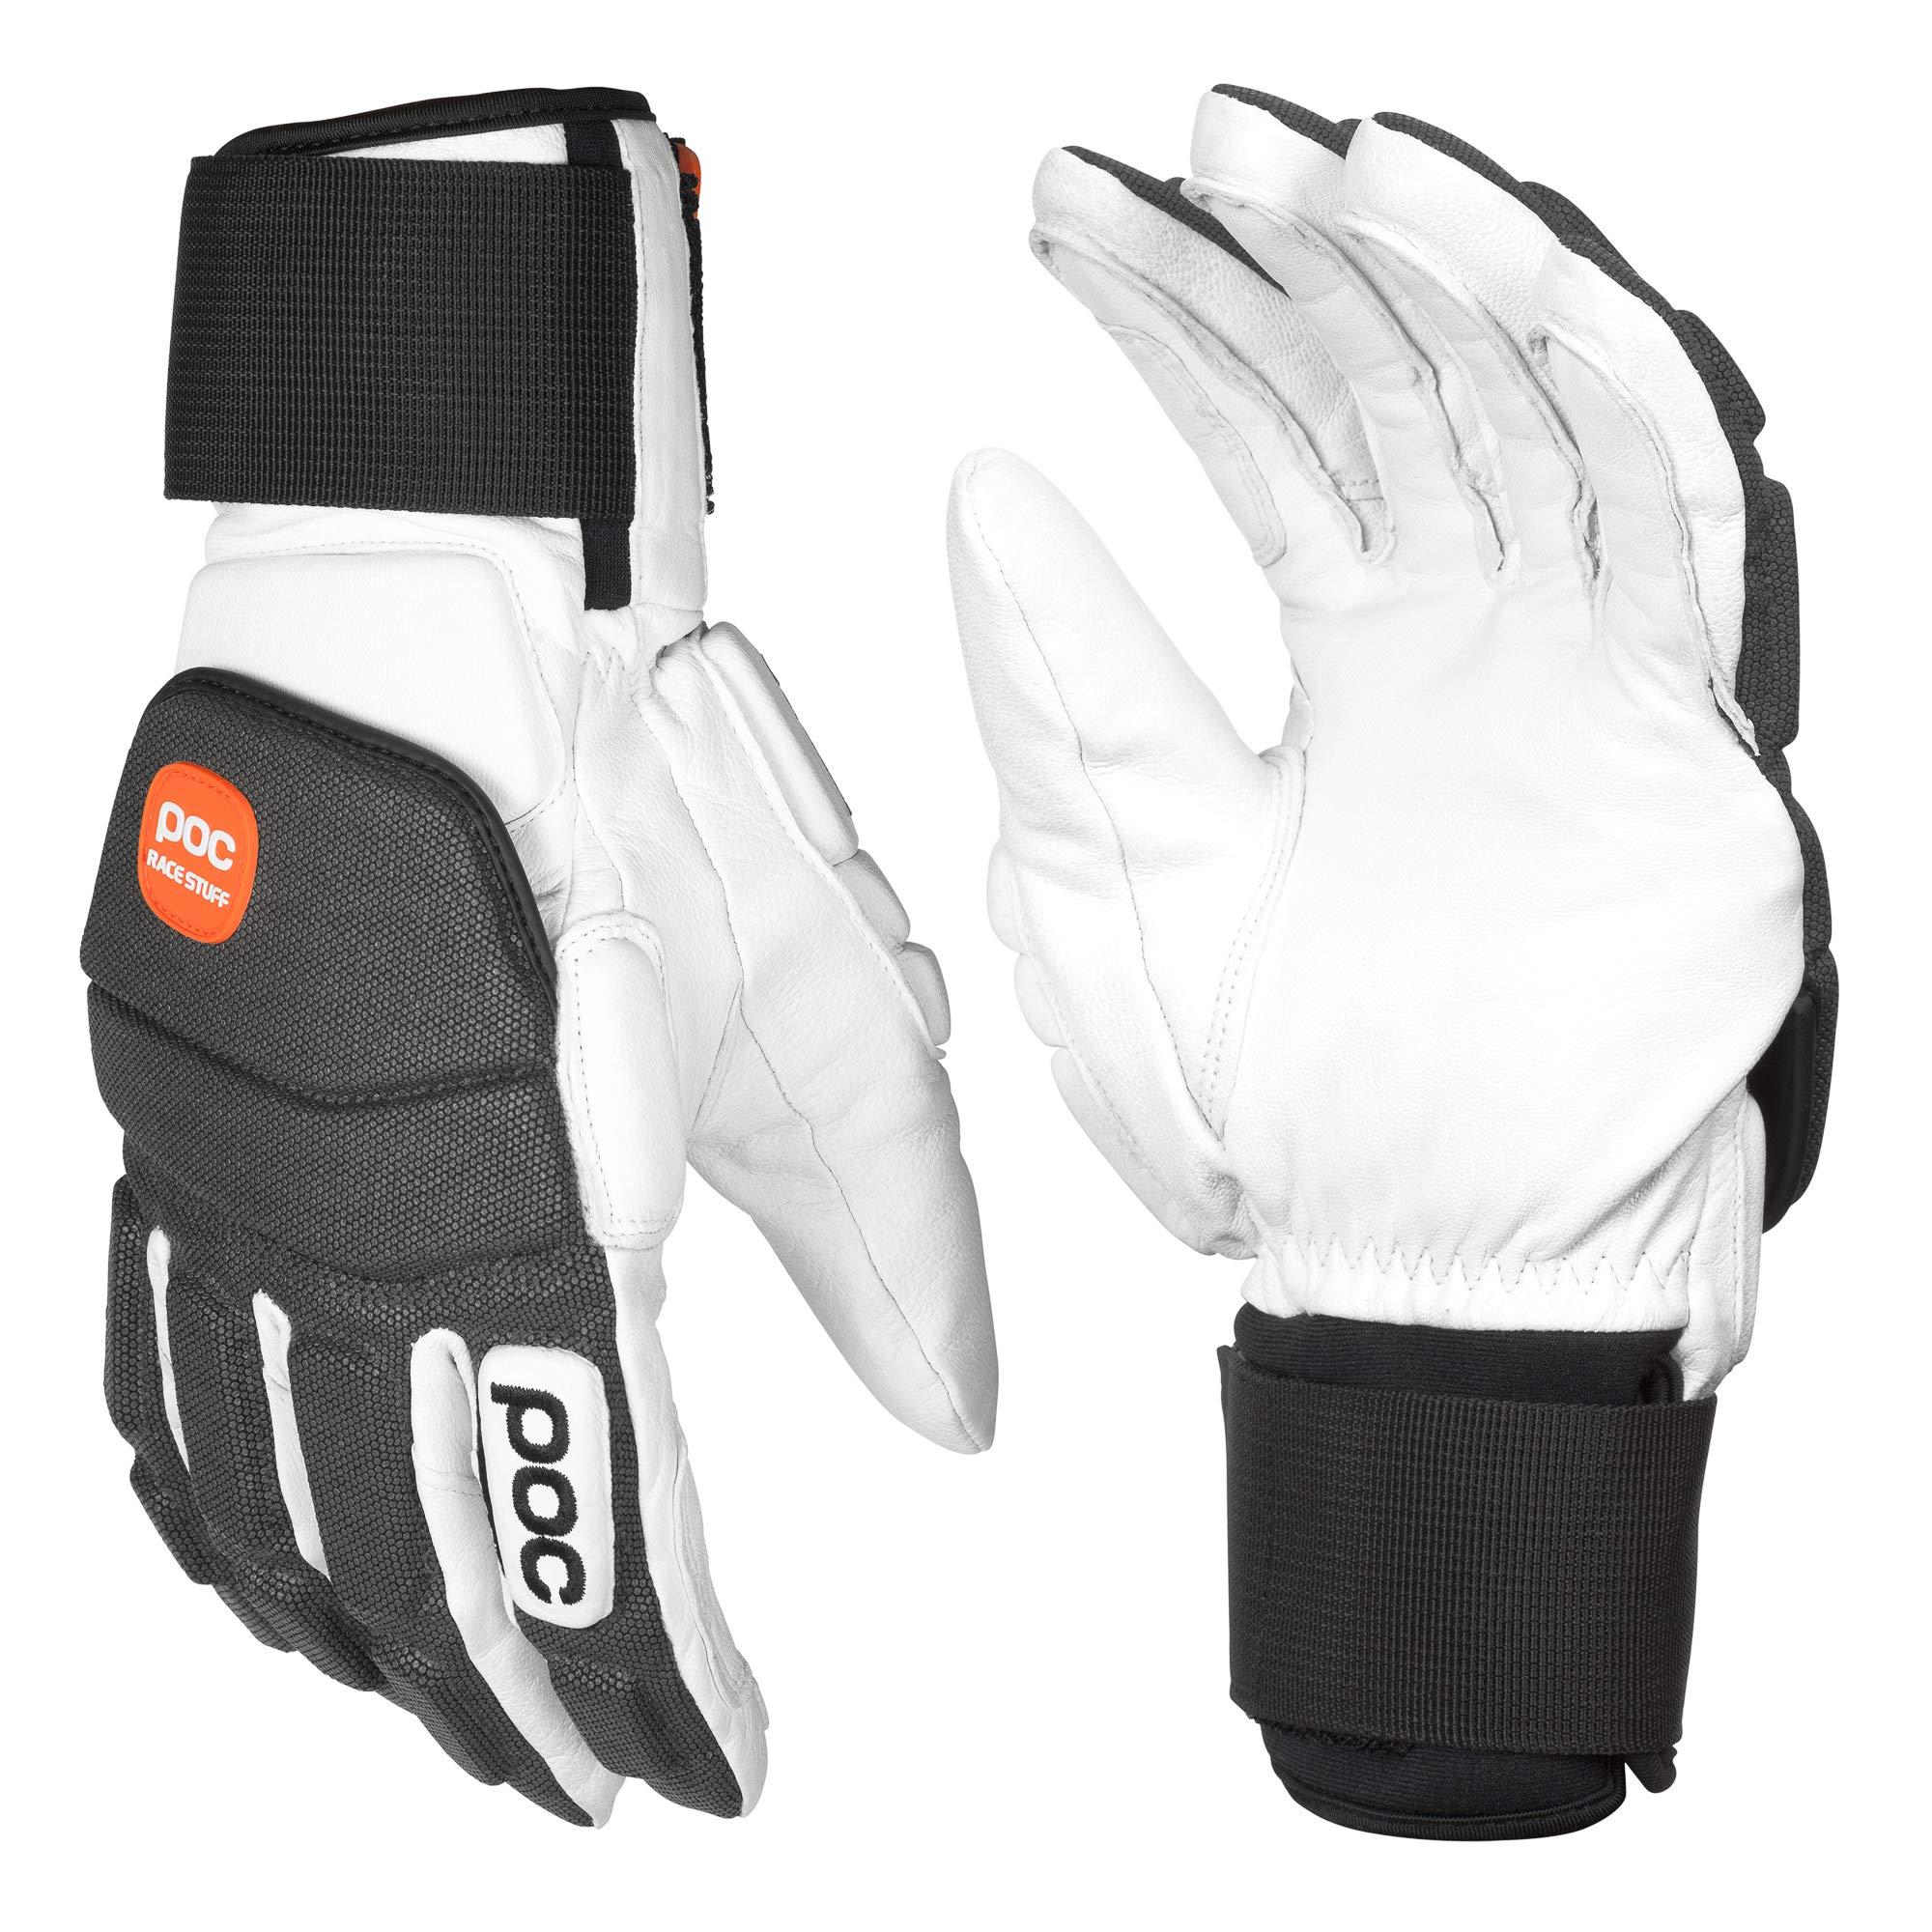 POC Super Palm Comp Skiing Gloves, Hydrogen White, Large